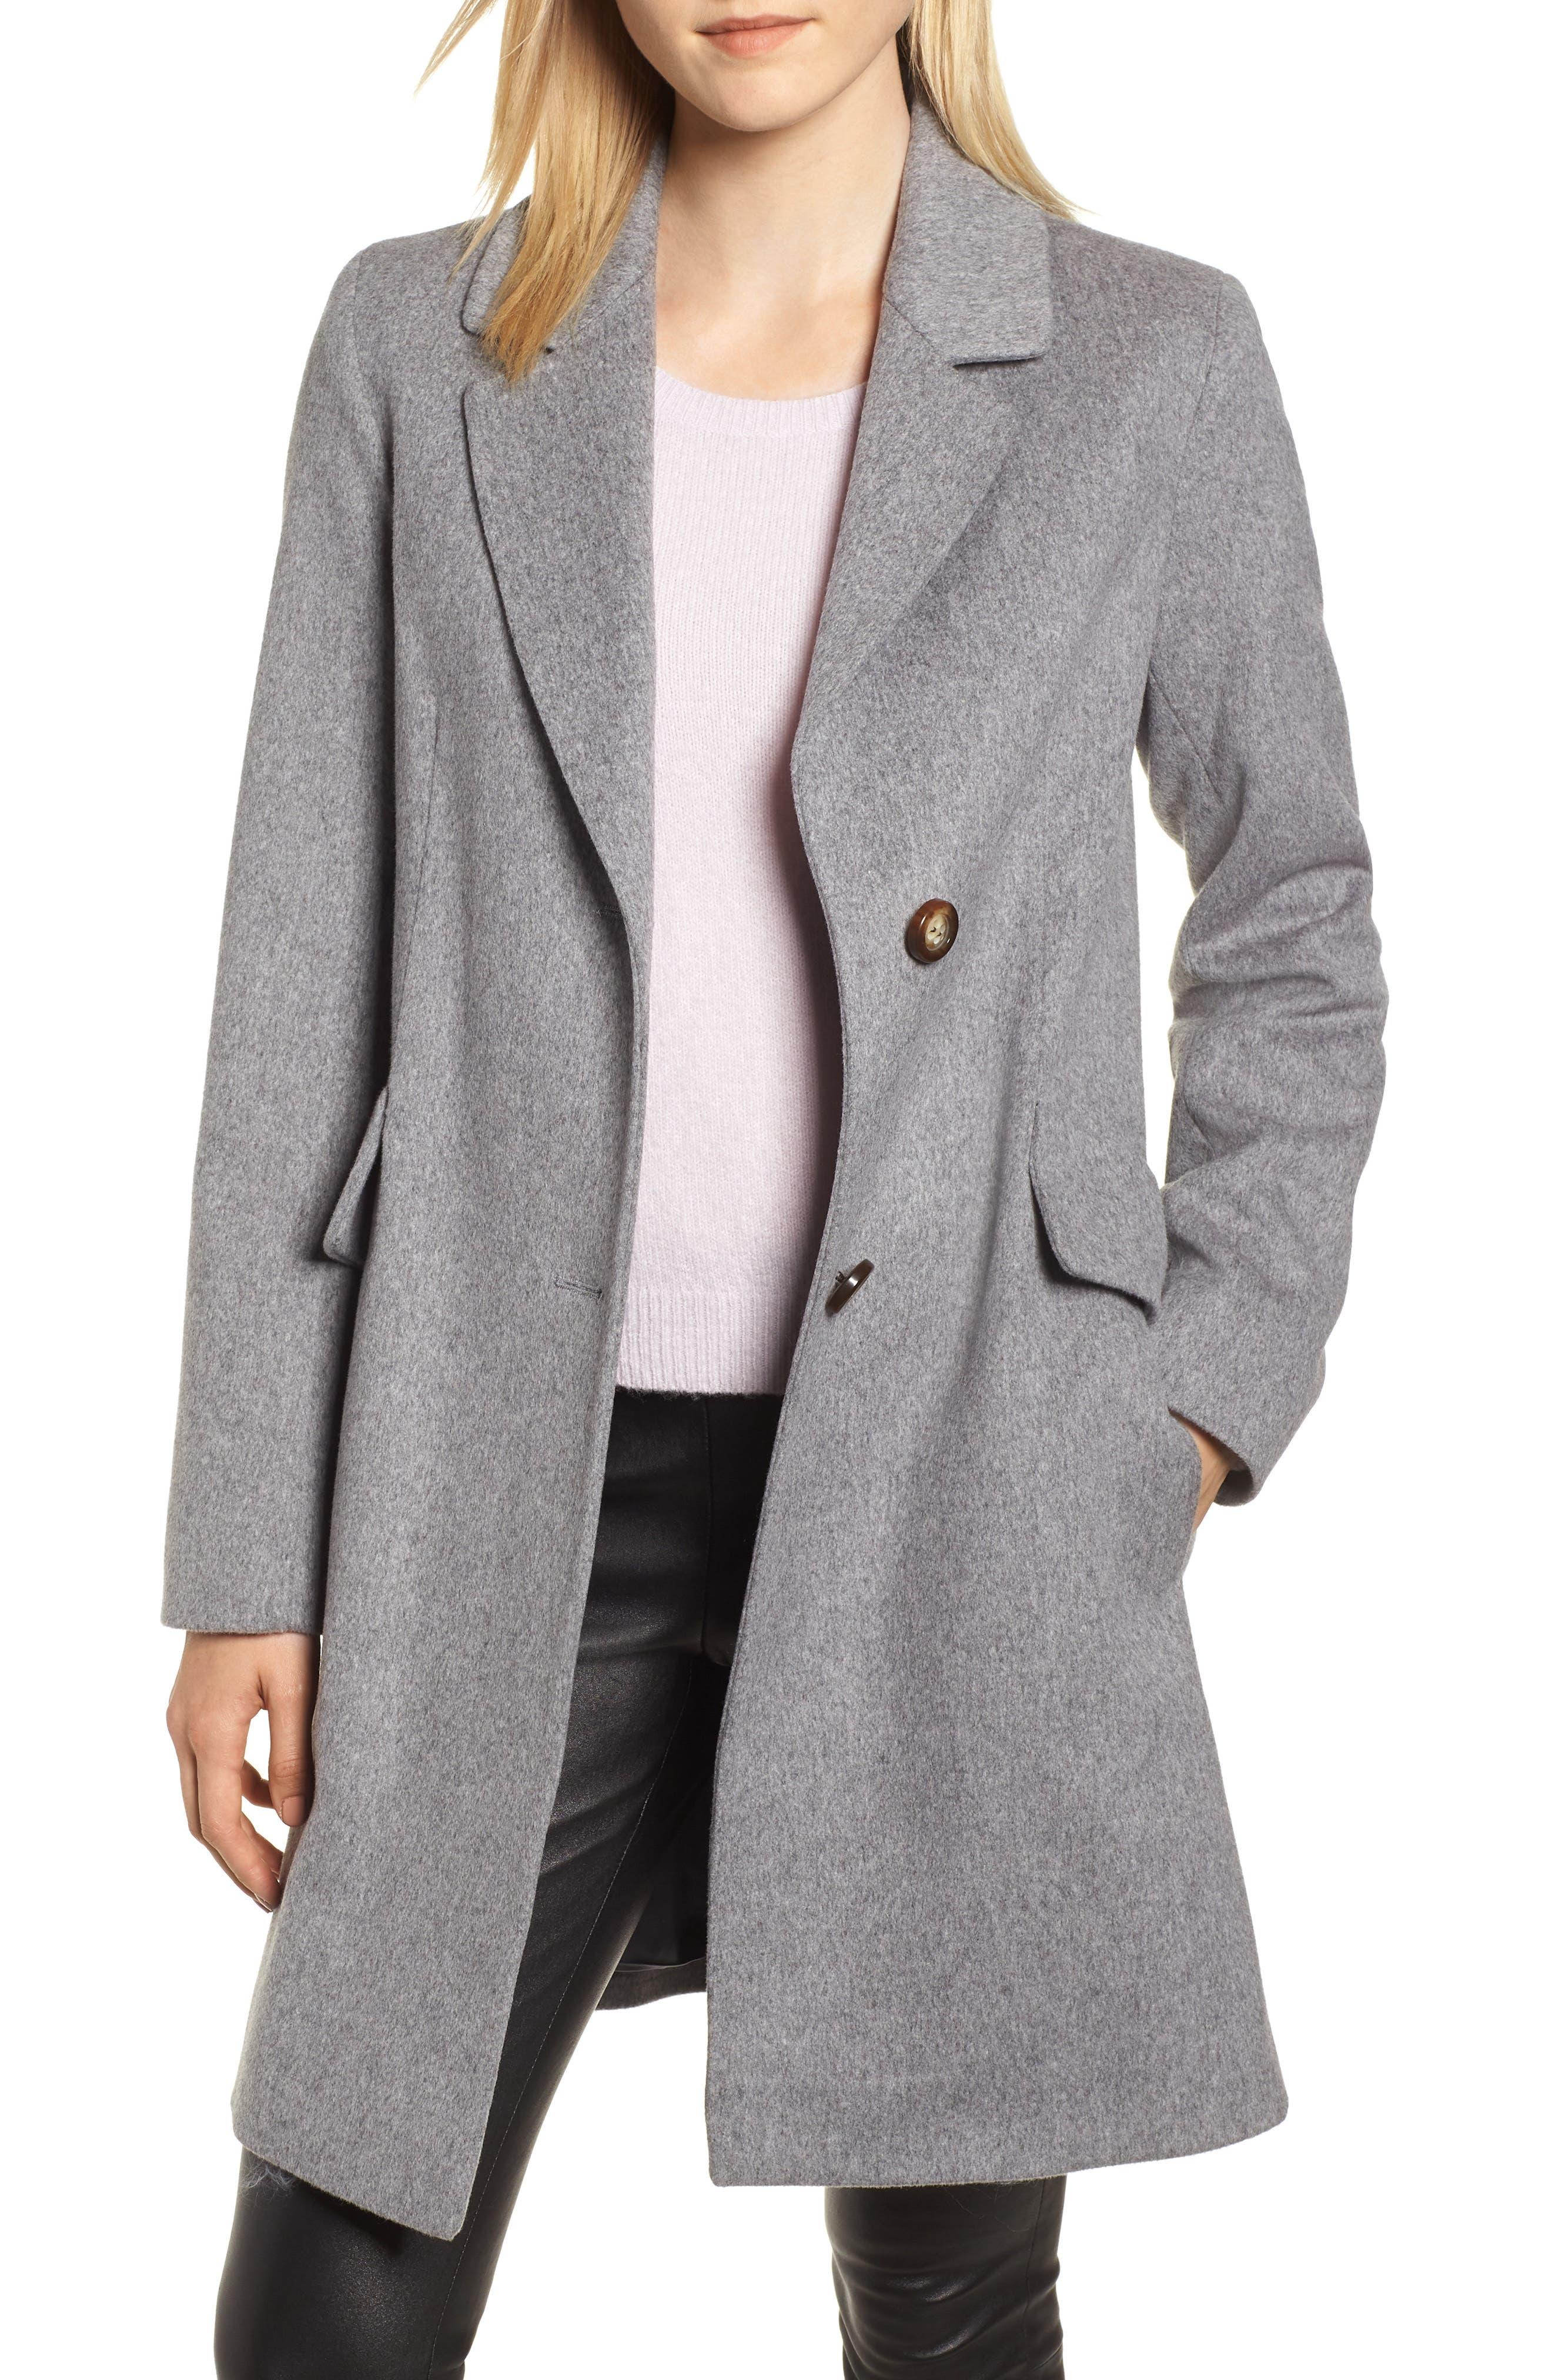 Notch Collar Wool Coat,                             Main thumbnail 1, color,                             GREY HEATHER